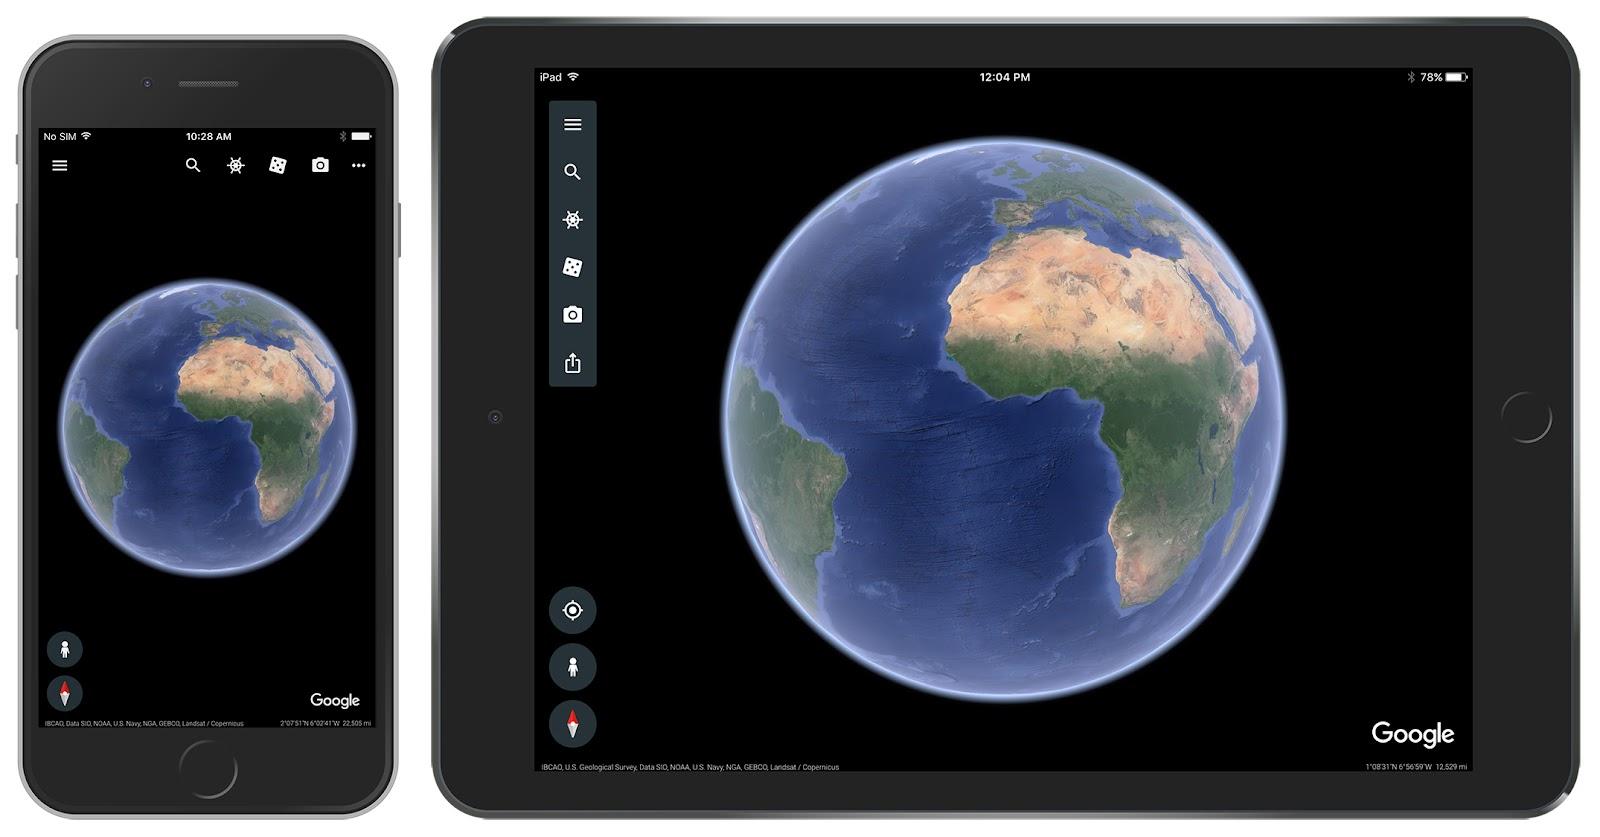 Introducing the new Google Earth for iOS - Google Maps Help on google maps for windows phone, google maps for windows 8, gps maps for ipad, google maps for iphone, google maps for kindle fire, google maps for android, google play for ipad, google maps for car, google drive for ipad, google chrome for ipad,